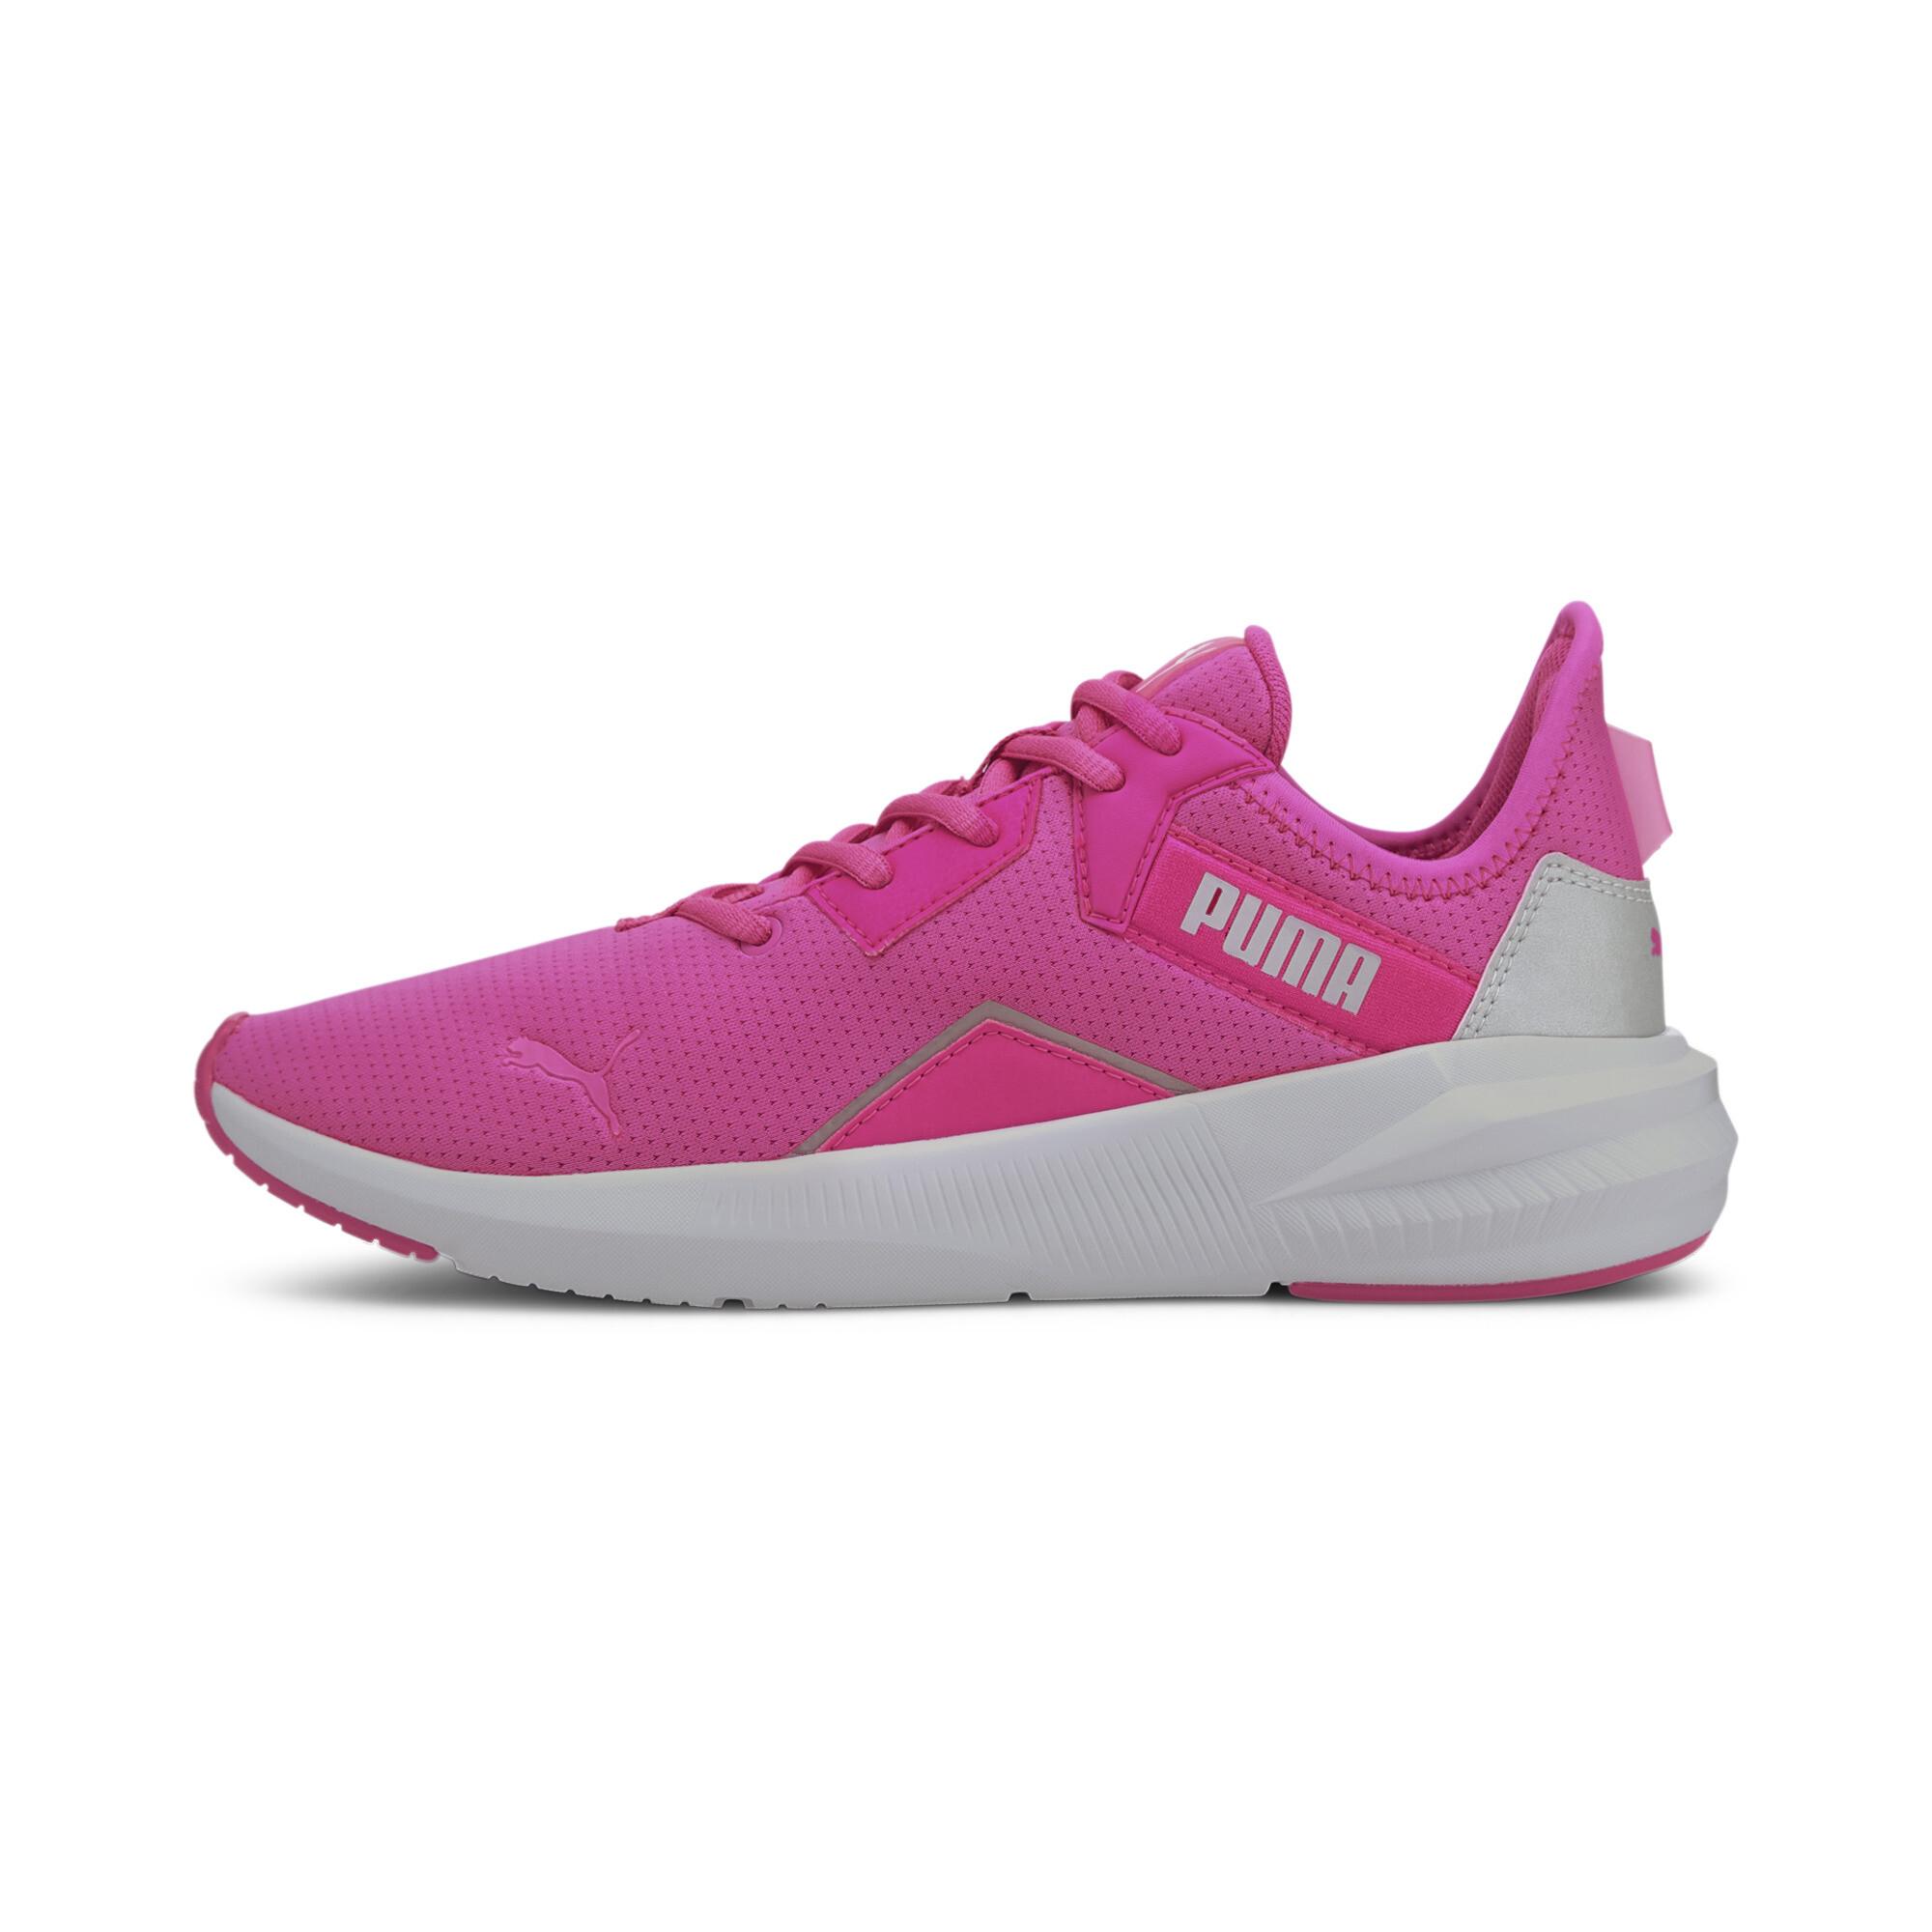 thumbnail 11 - PUMA-Women-039-s-Platinum-Training-Shoes